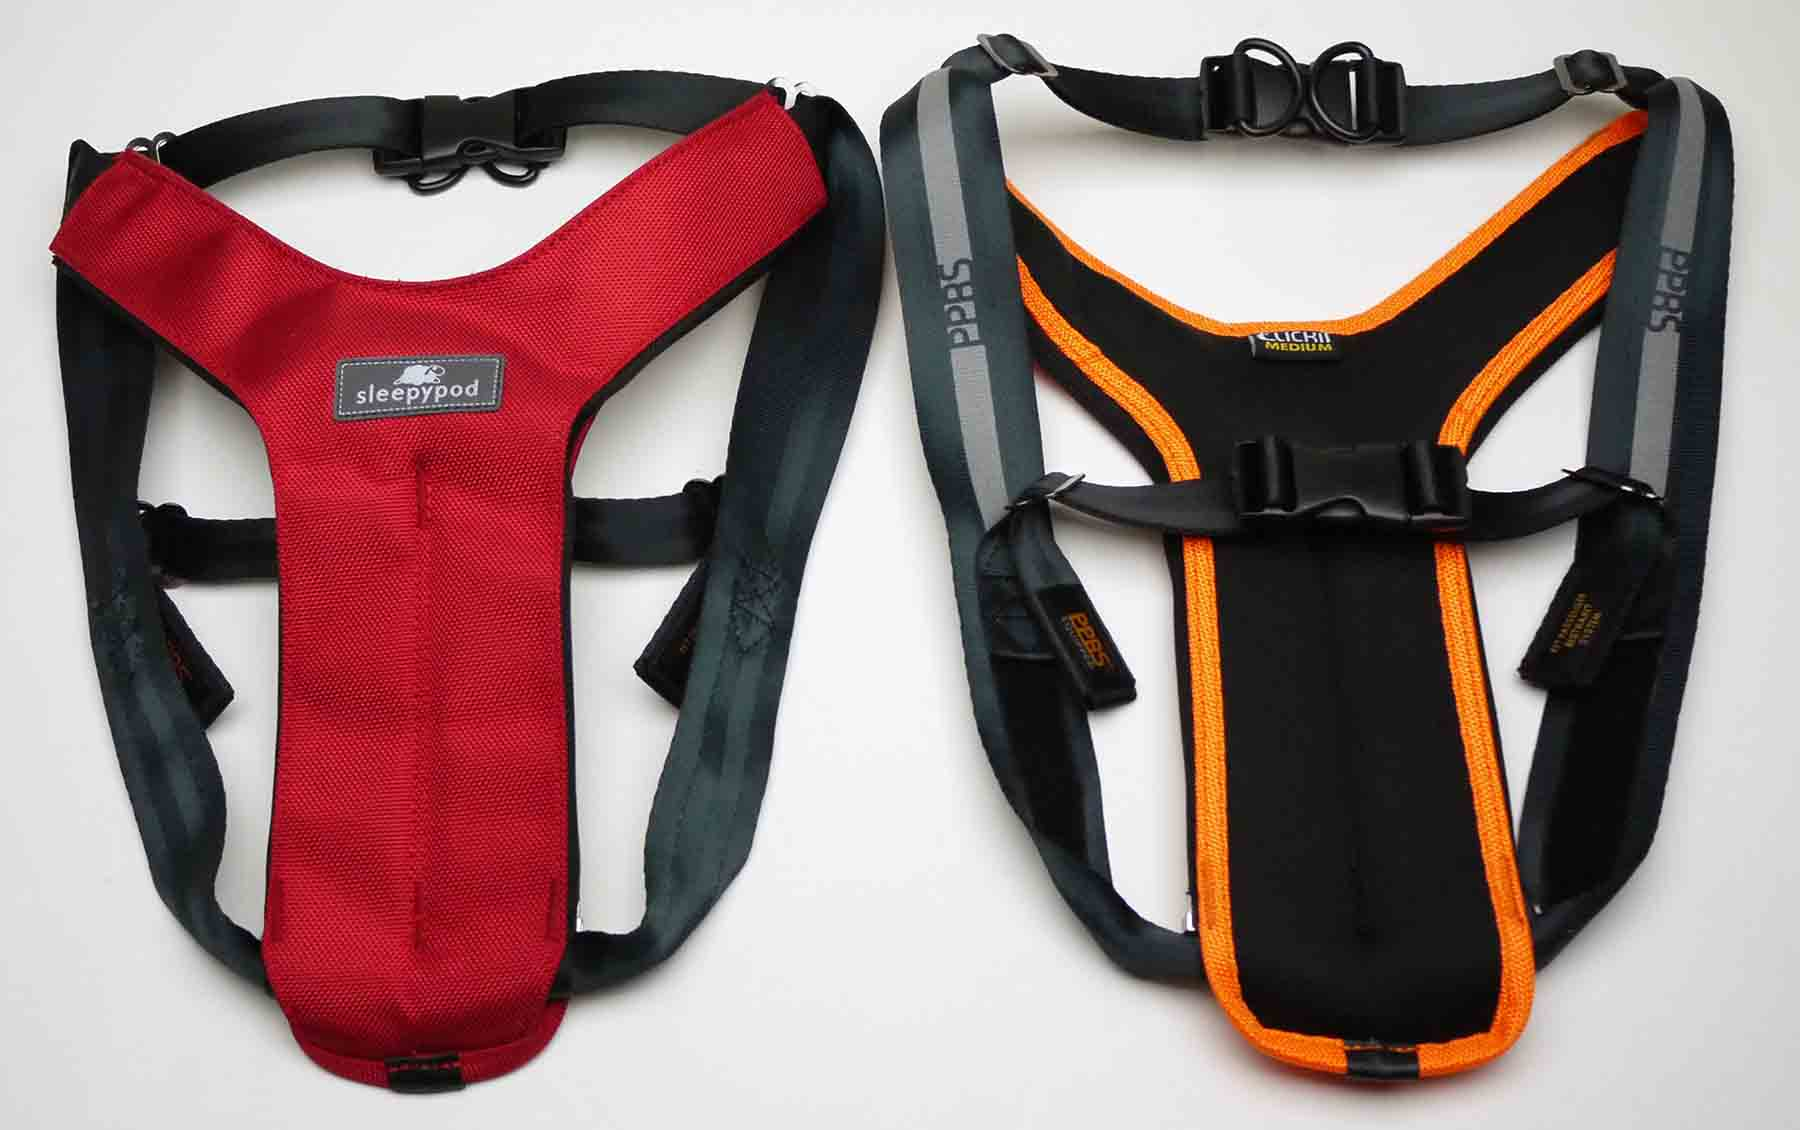 clickit-sport-Dog- harness